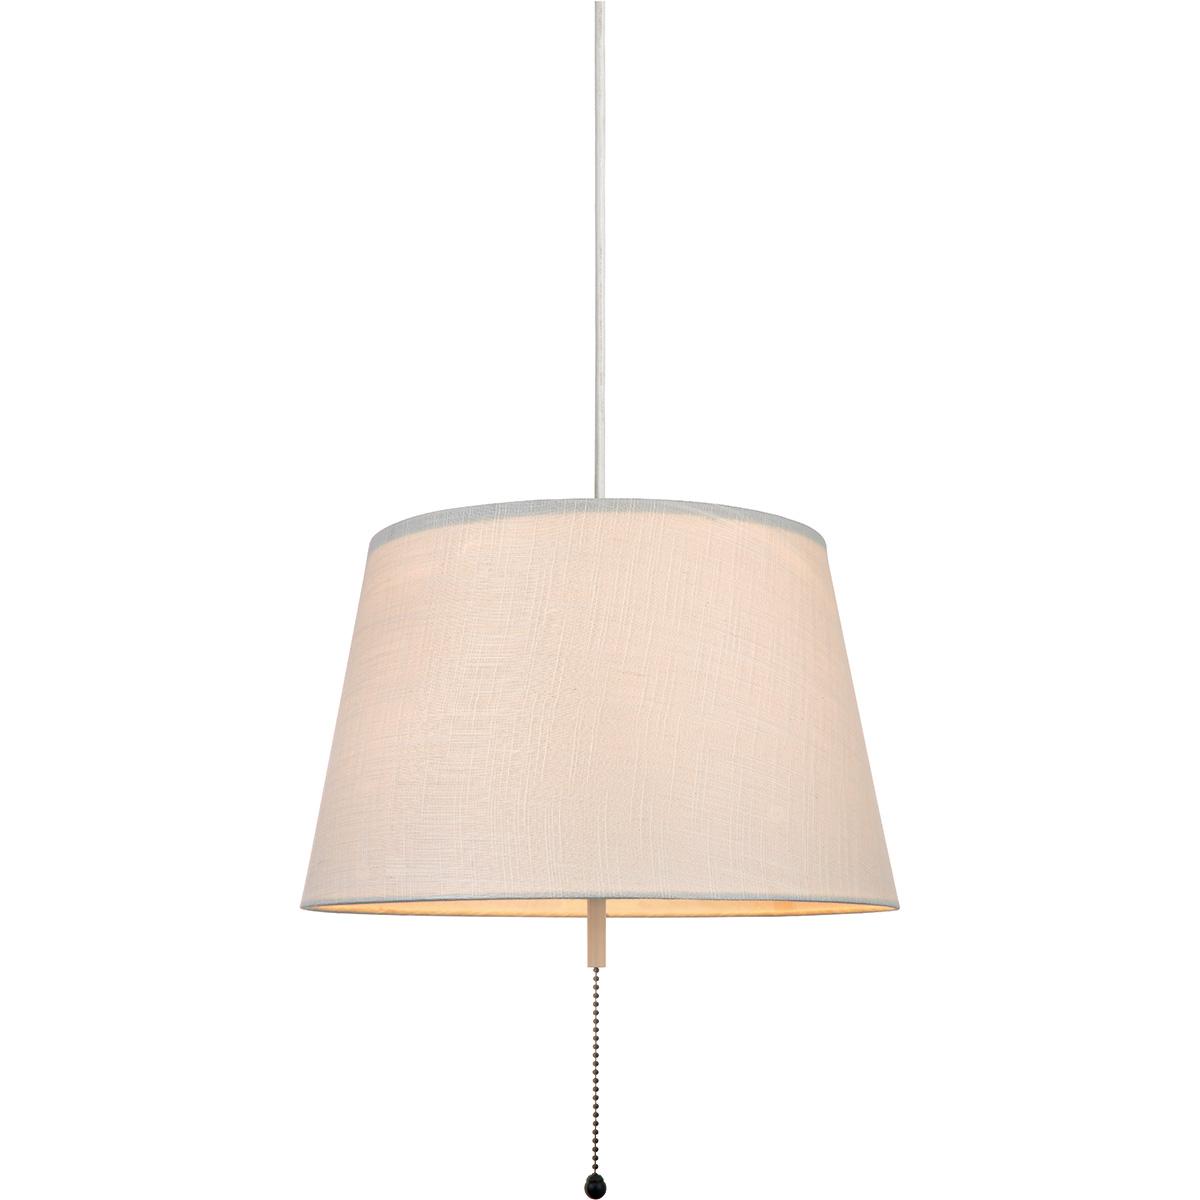 Image of   Halo Design loftlampe - Tower - Offwhite